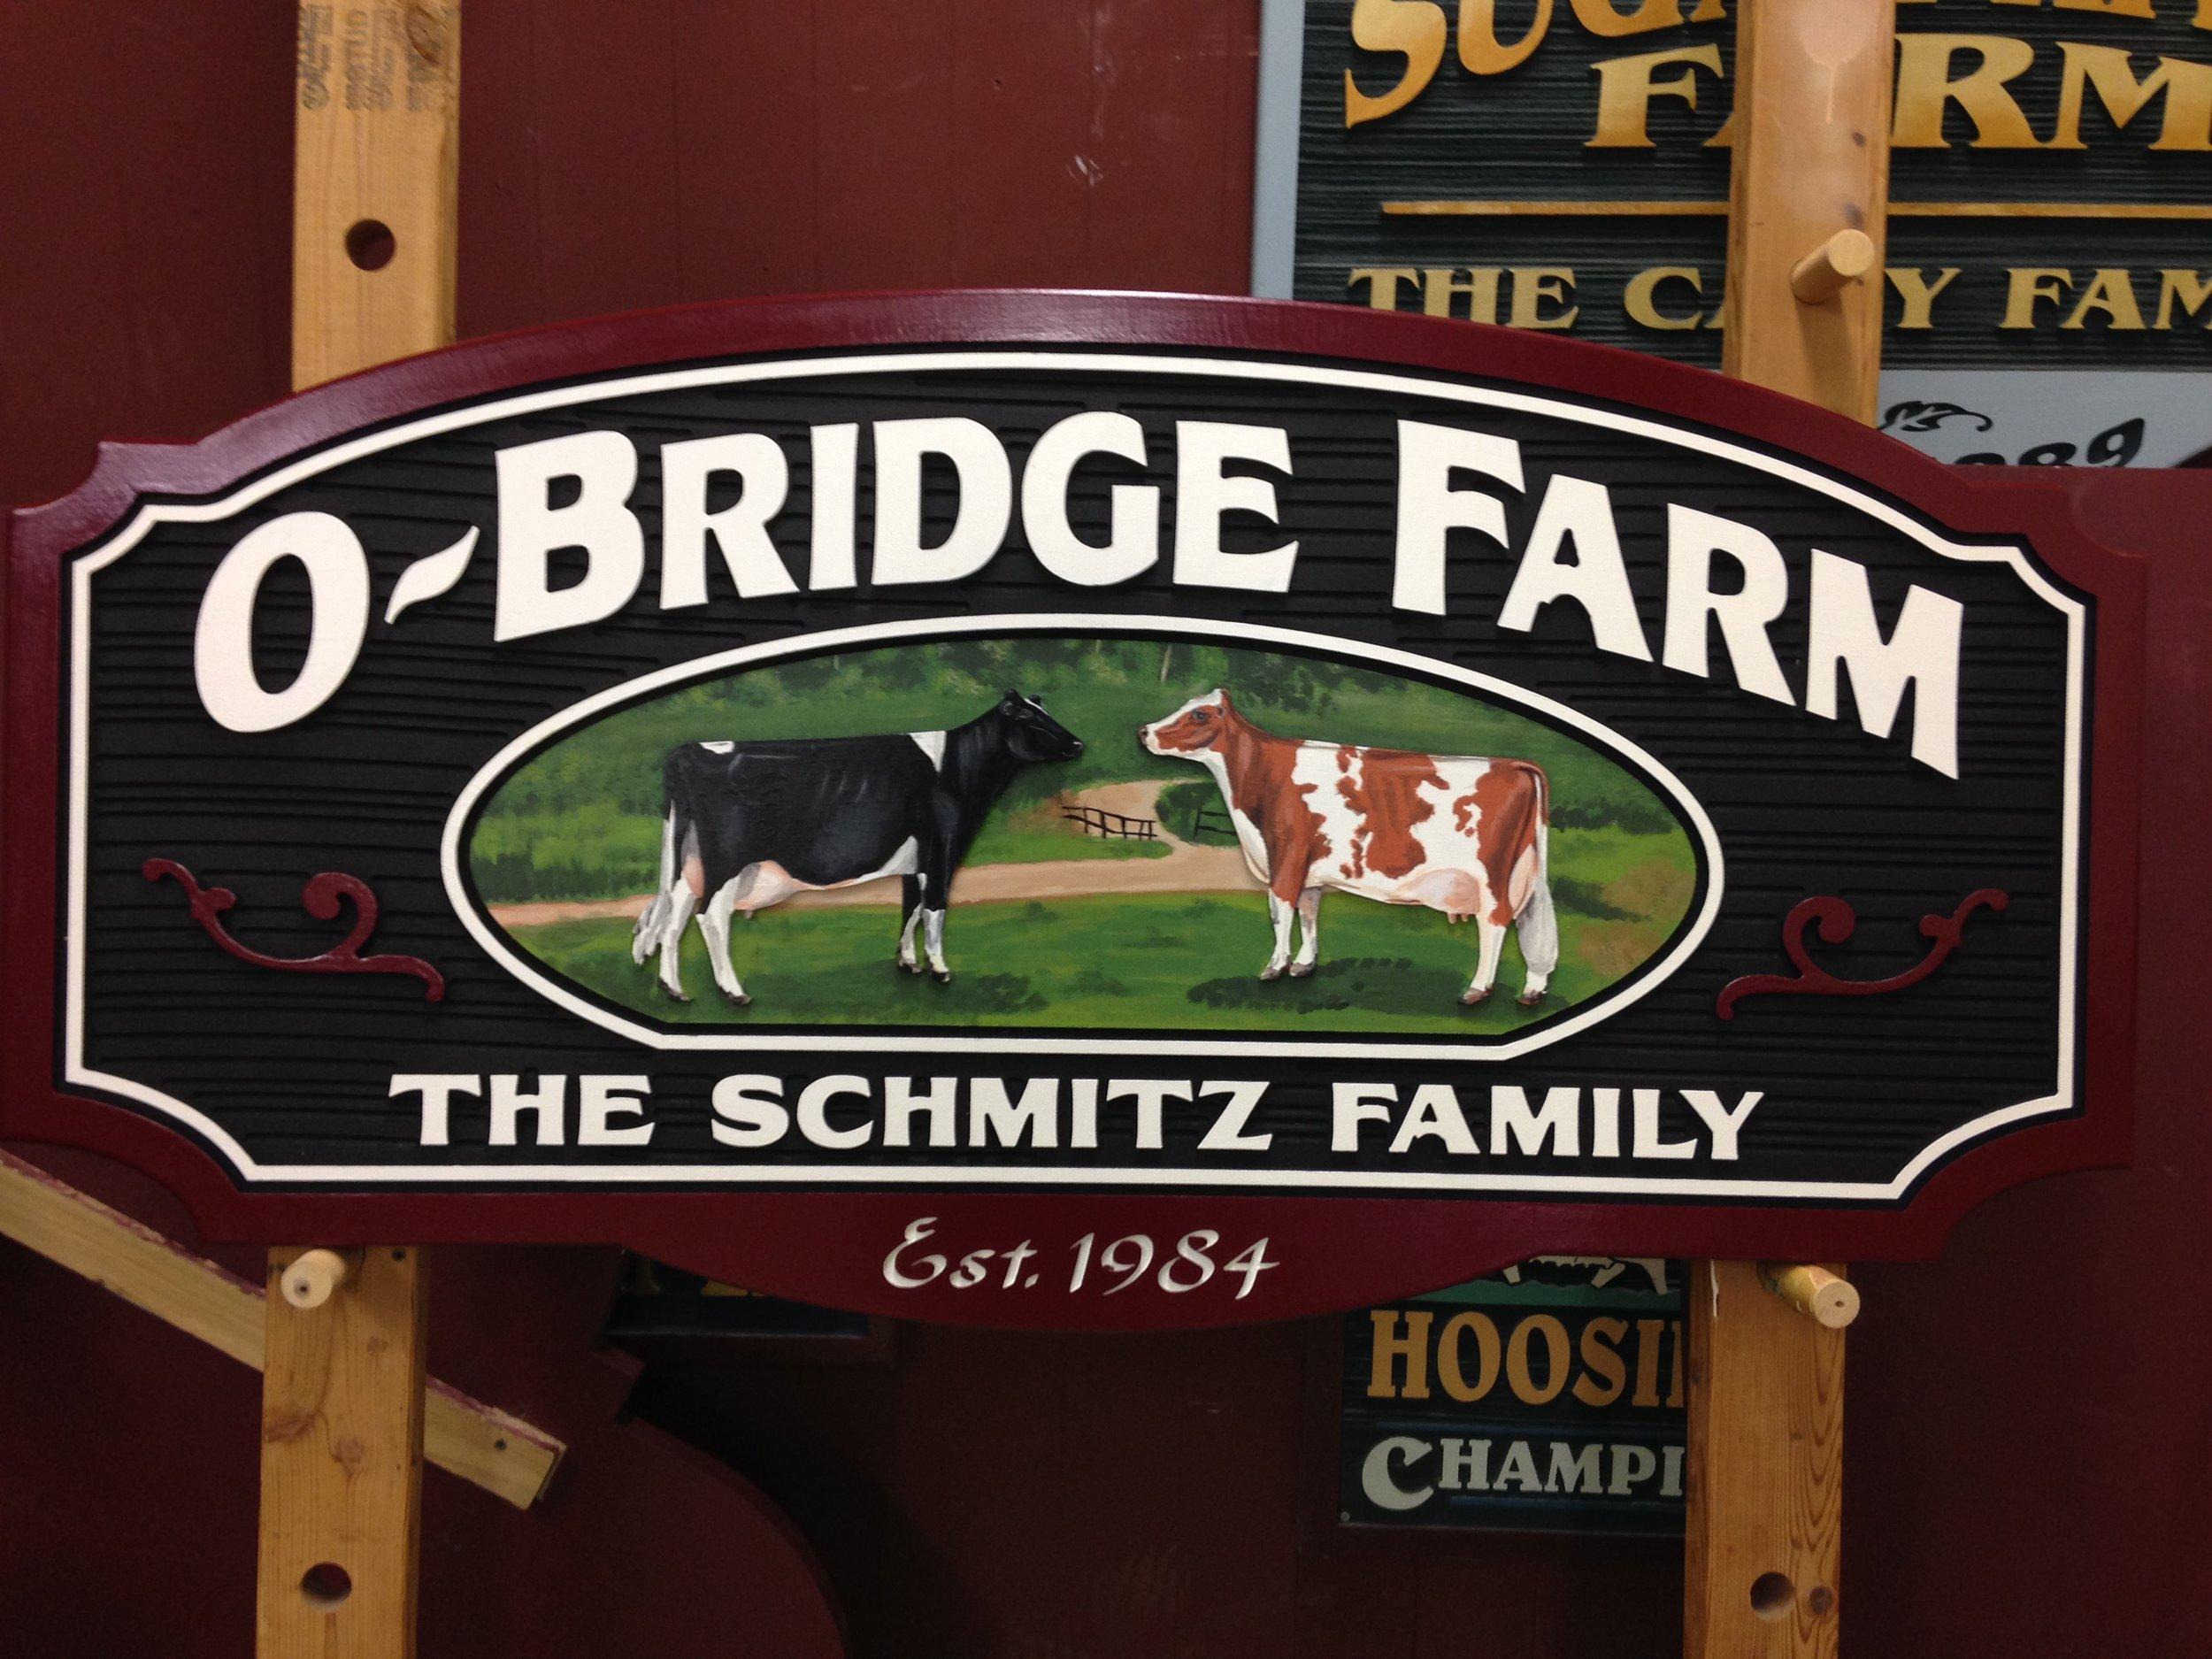 farm_obridge.jpg